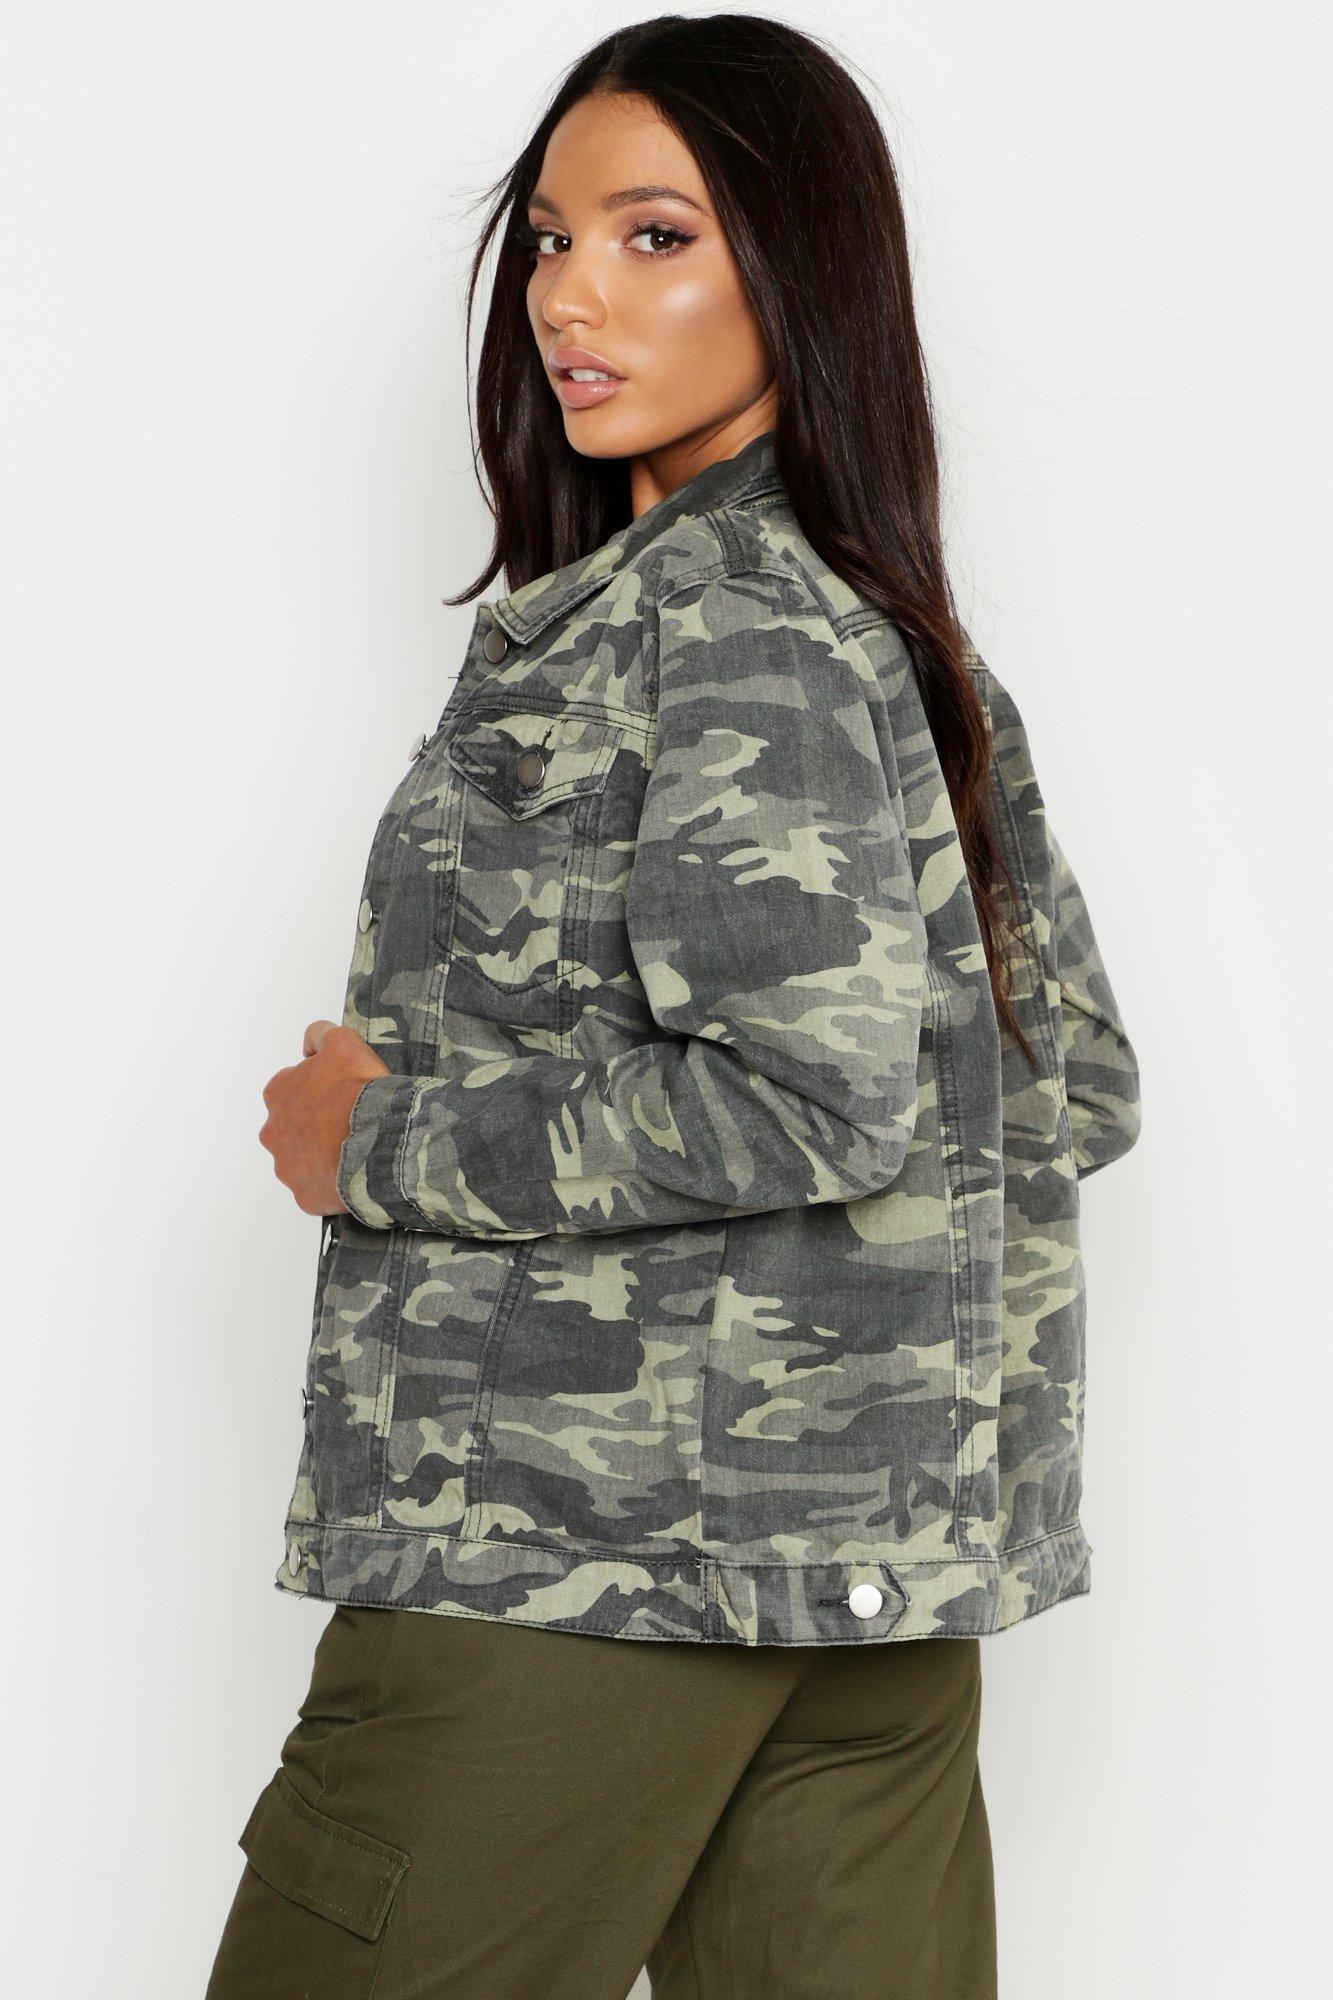 Oversized Camo Denim Jacket Boohoo Camo Denim Jacket Jackets Denim Jacket [ 2000 x 1333 Pixel ]